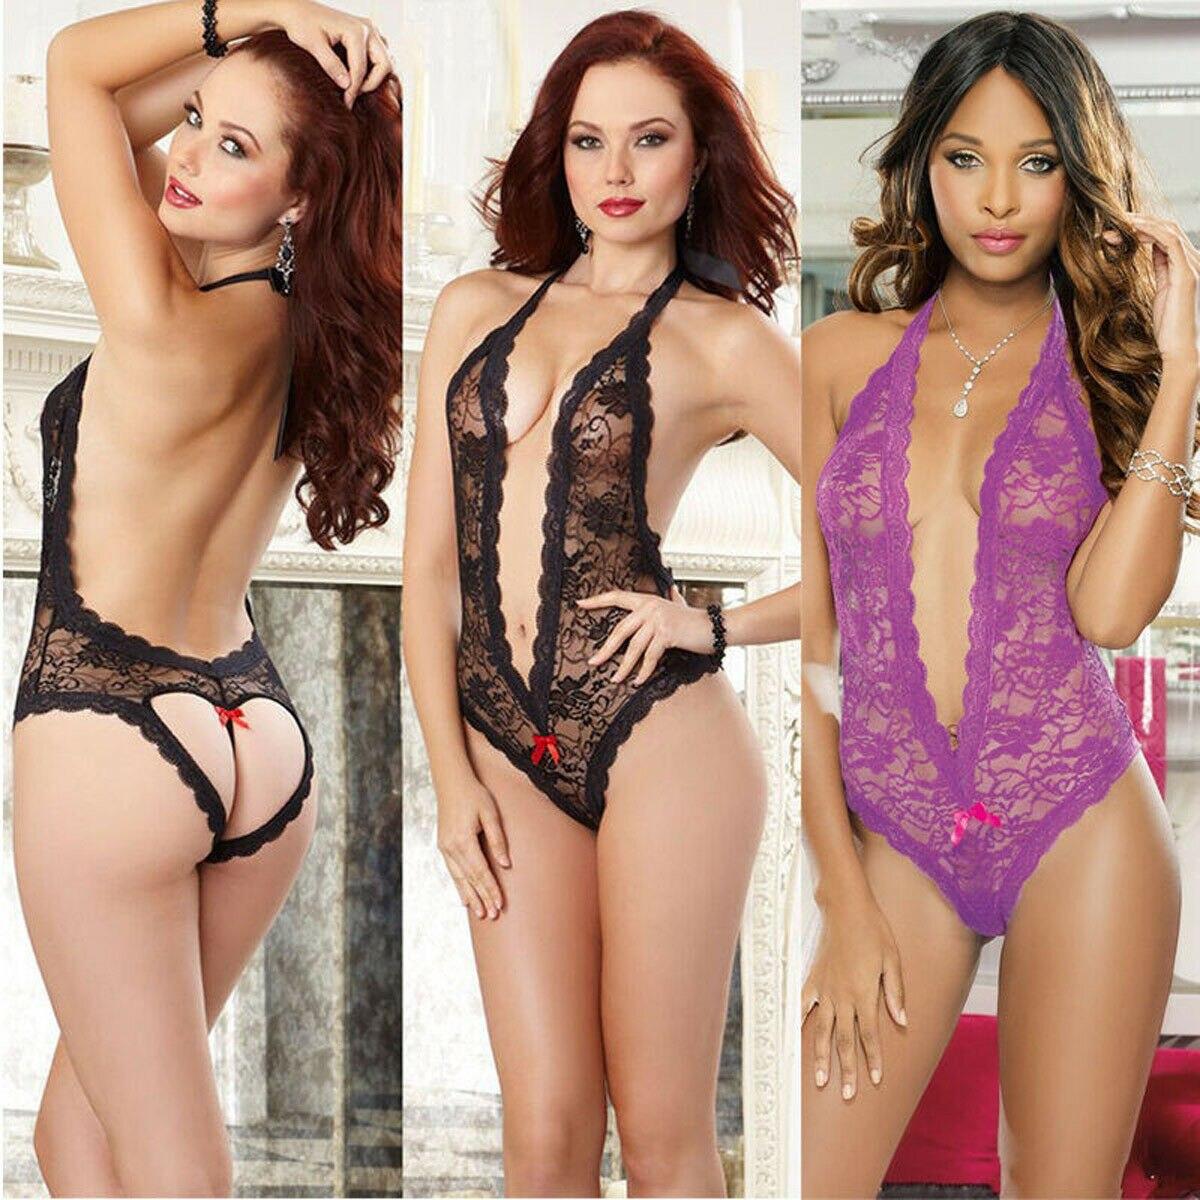 Women Sexy/Sissy Lingerie Babydoll G-String Lace Thong Underwear Nightwear